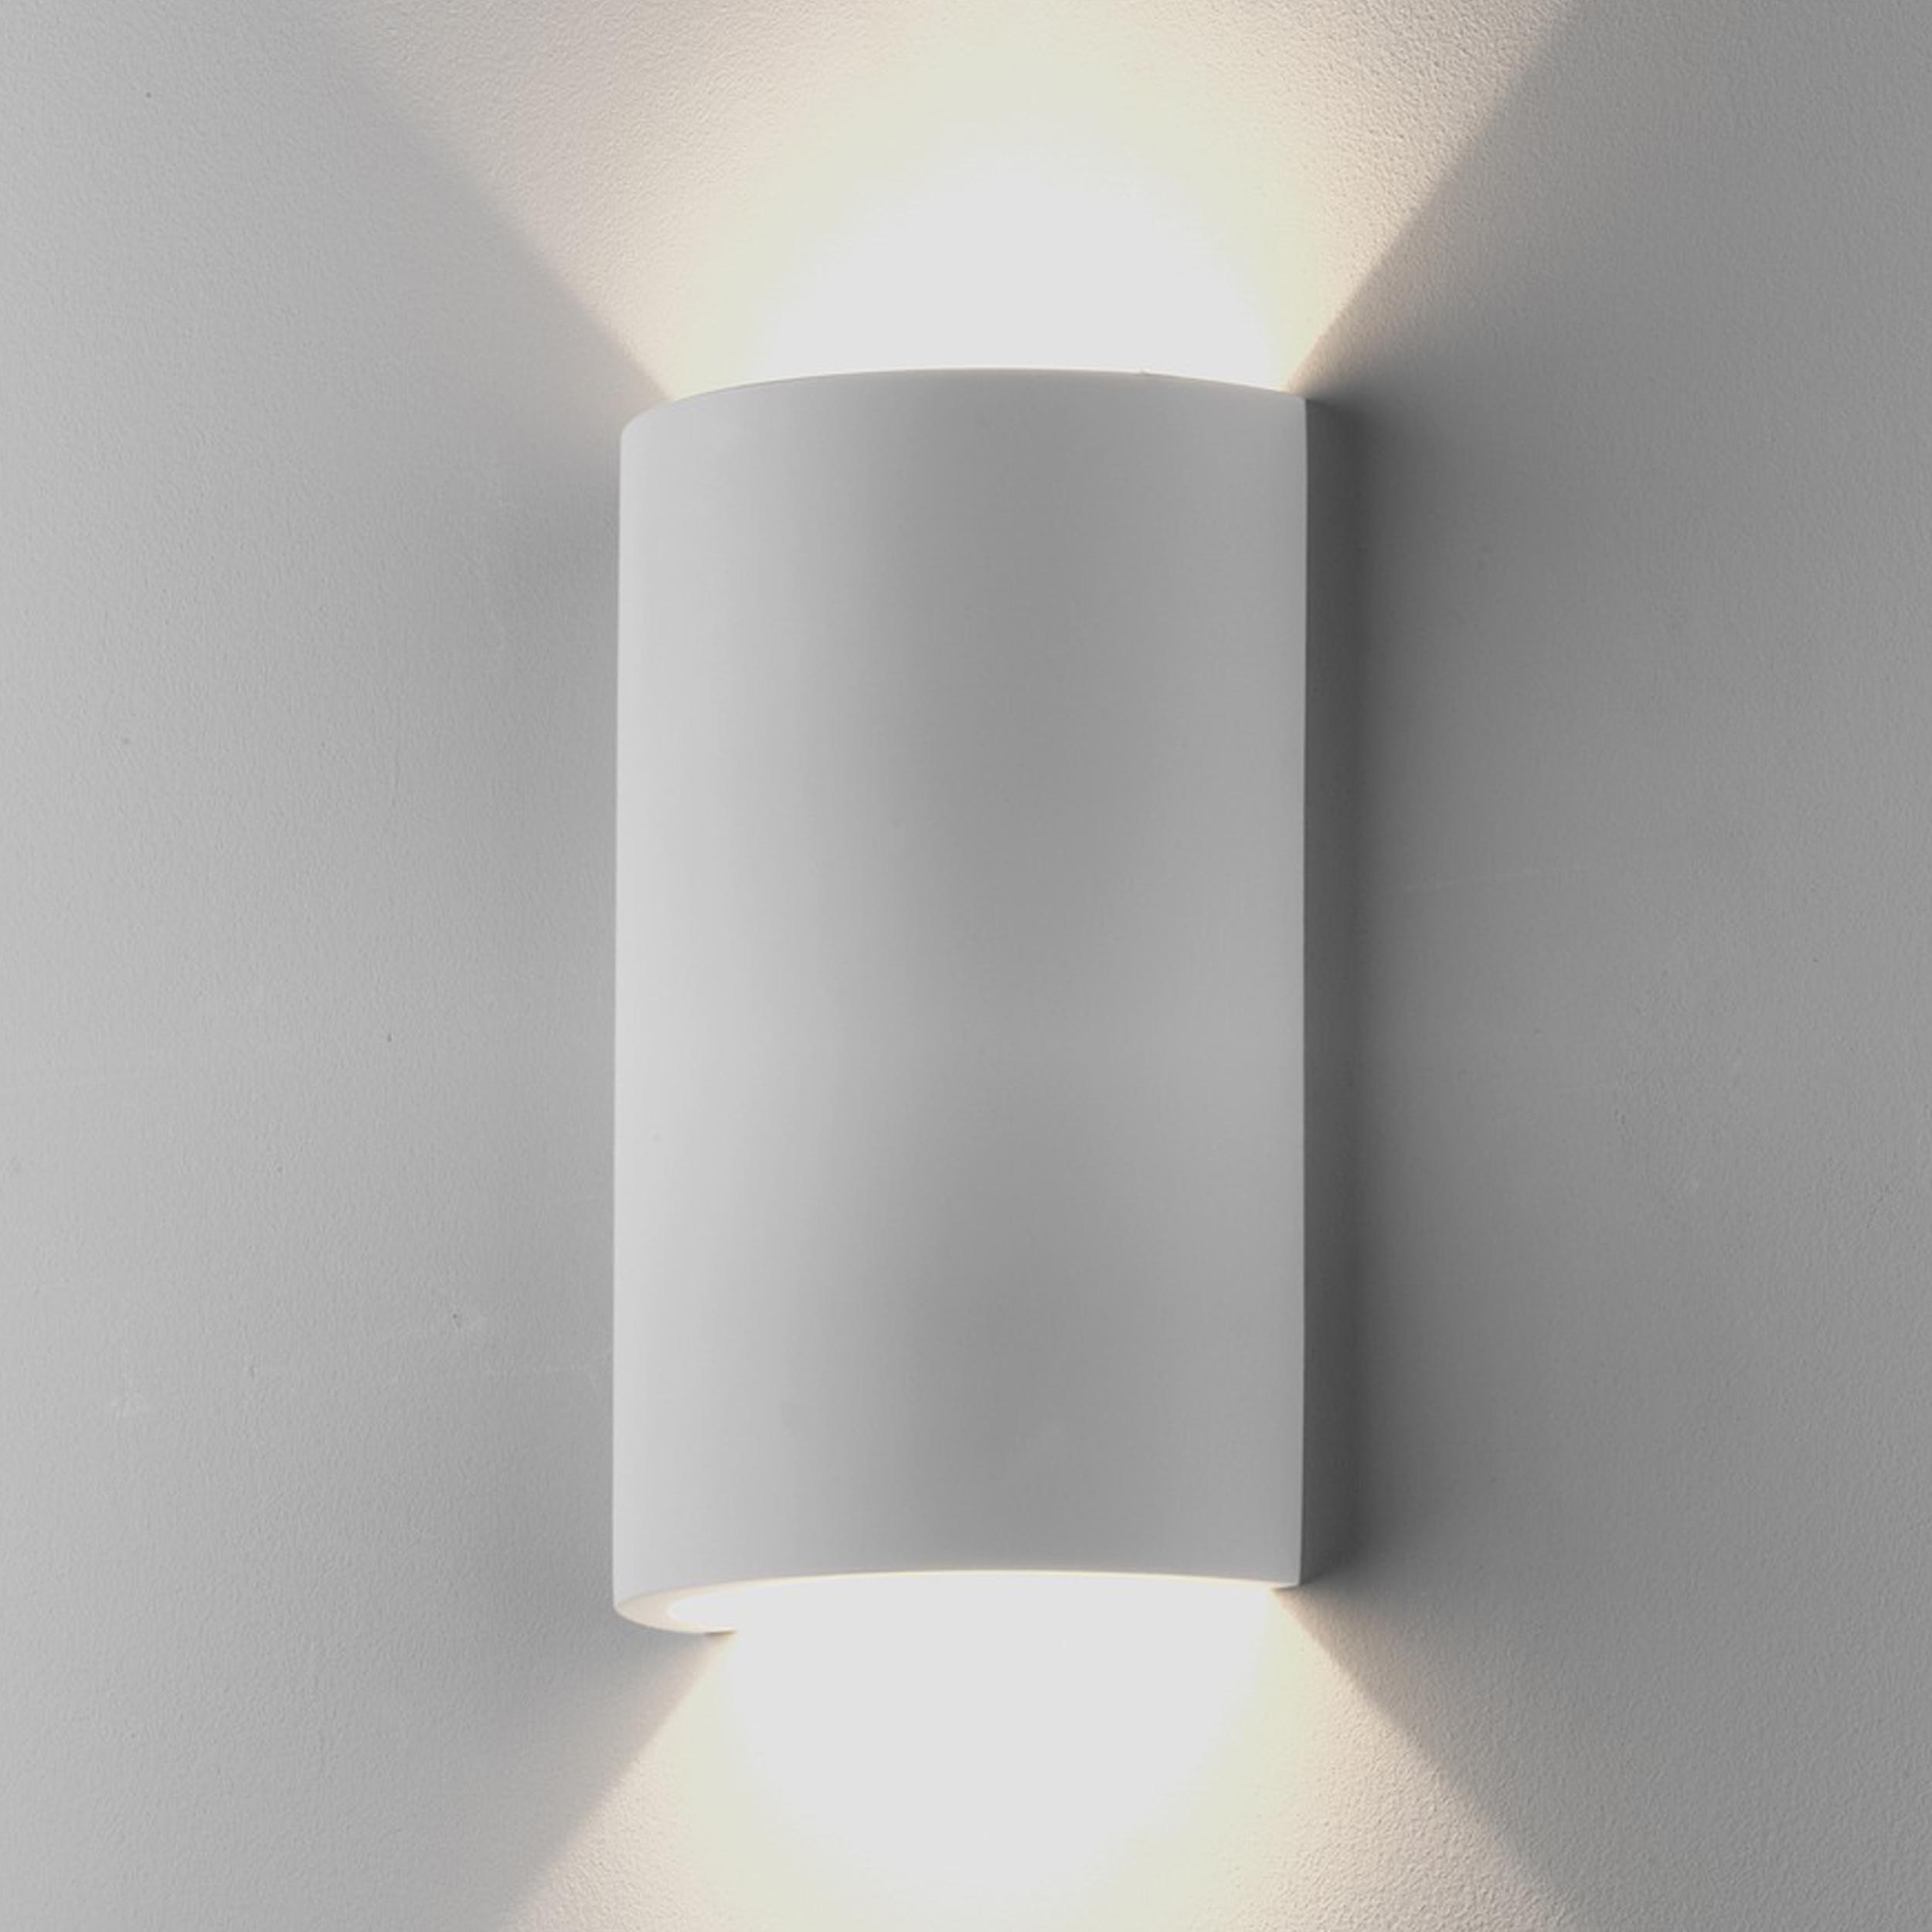 Astro Serifos 220 Wall Light Plaster